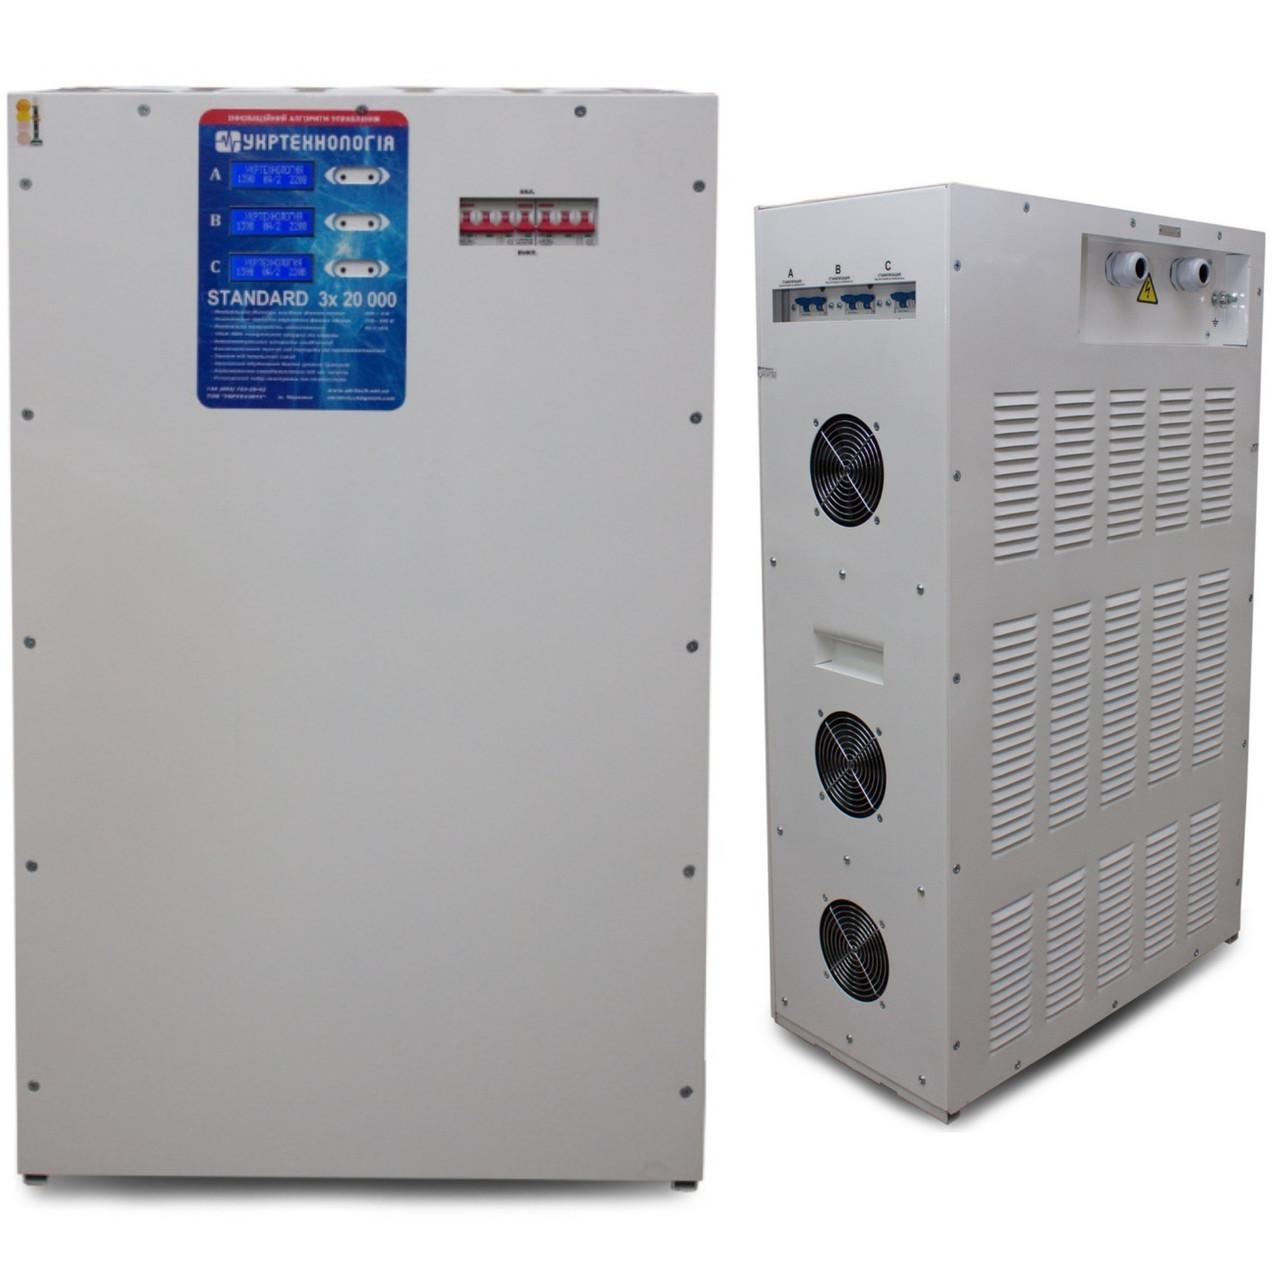 Стабилизатор напряжения Укртехнология HCH 3x15000 Infinity 45 кВт